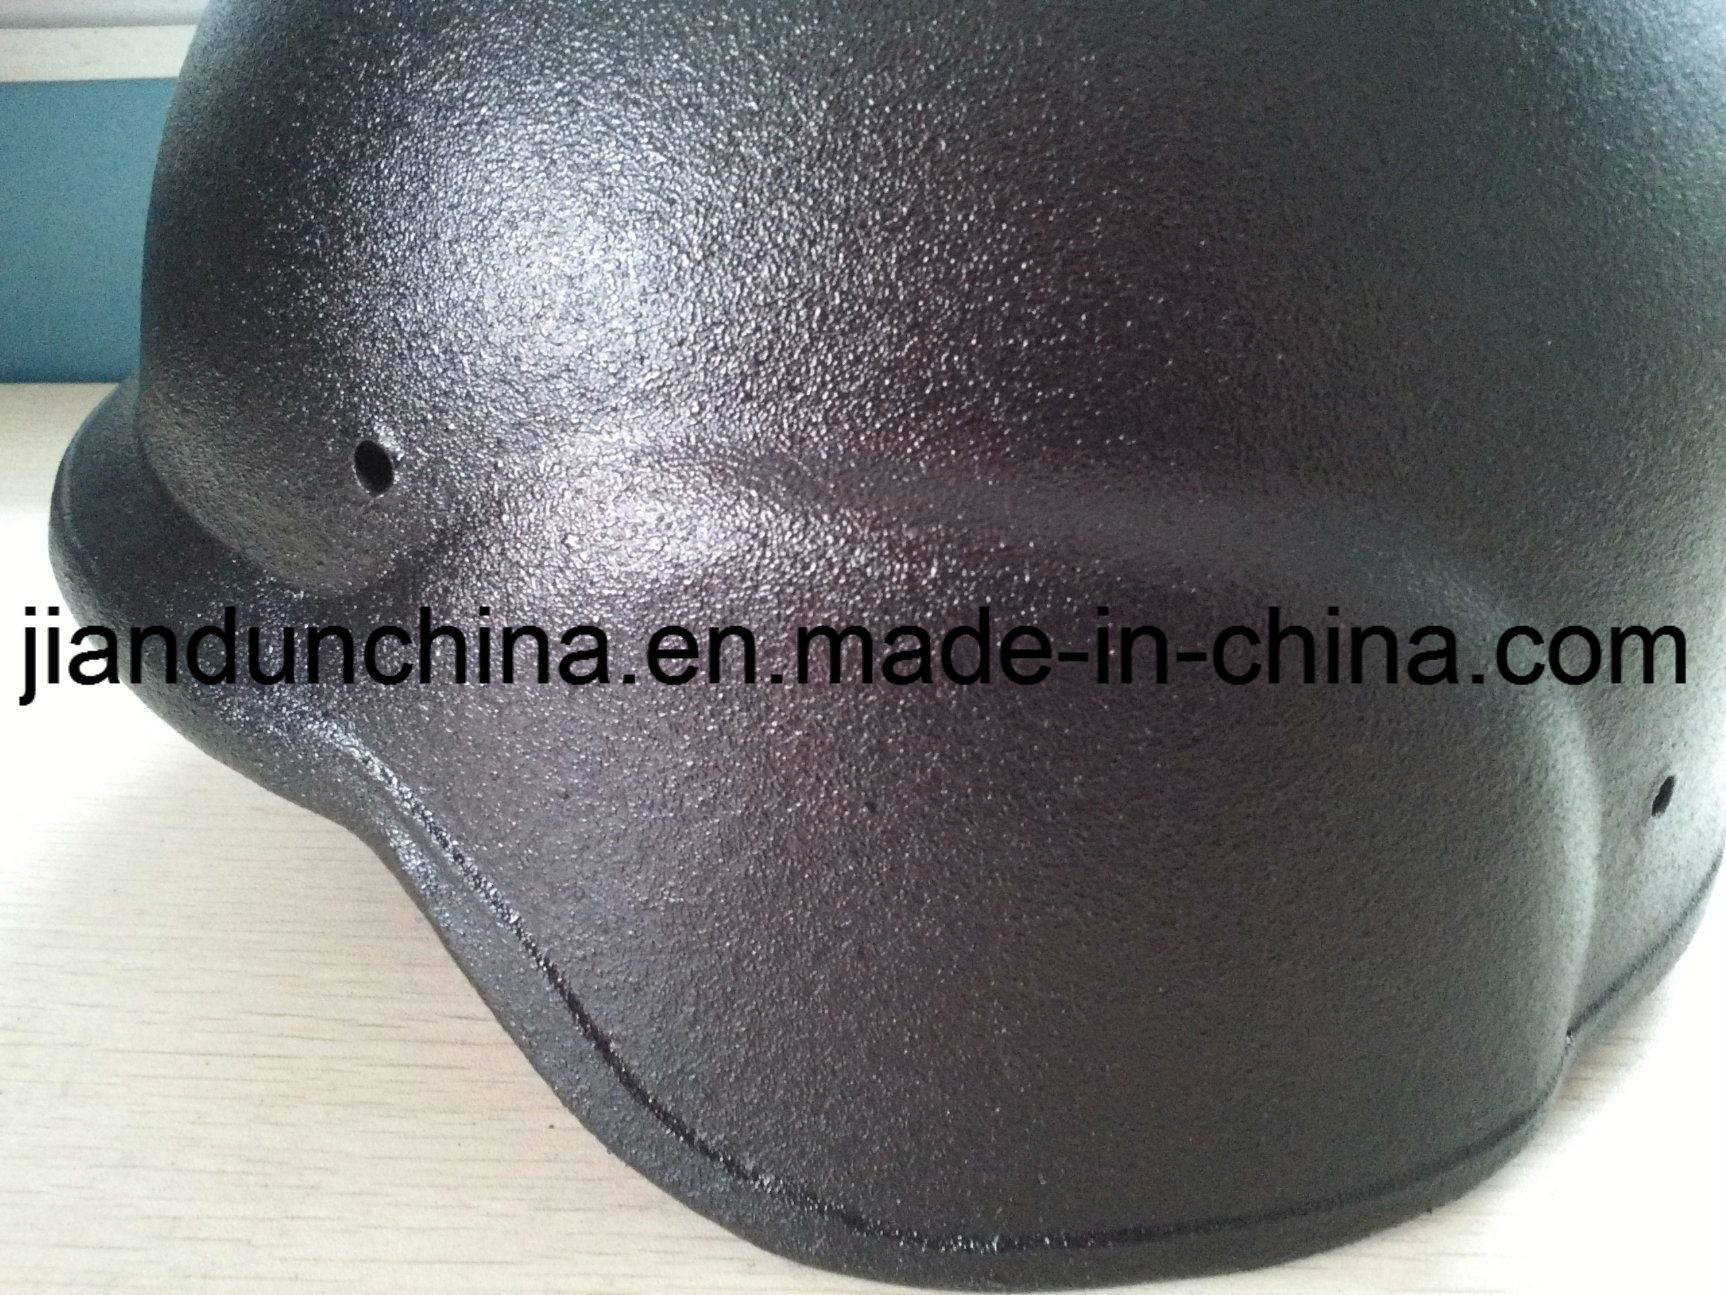 79fe03a9 BALLISTIC HELMET - Ningbo Jiandun Security Technology Co., Ltd. - page 1.